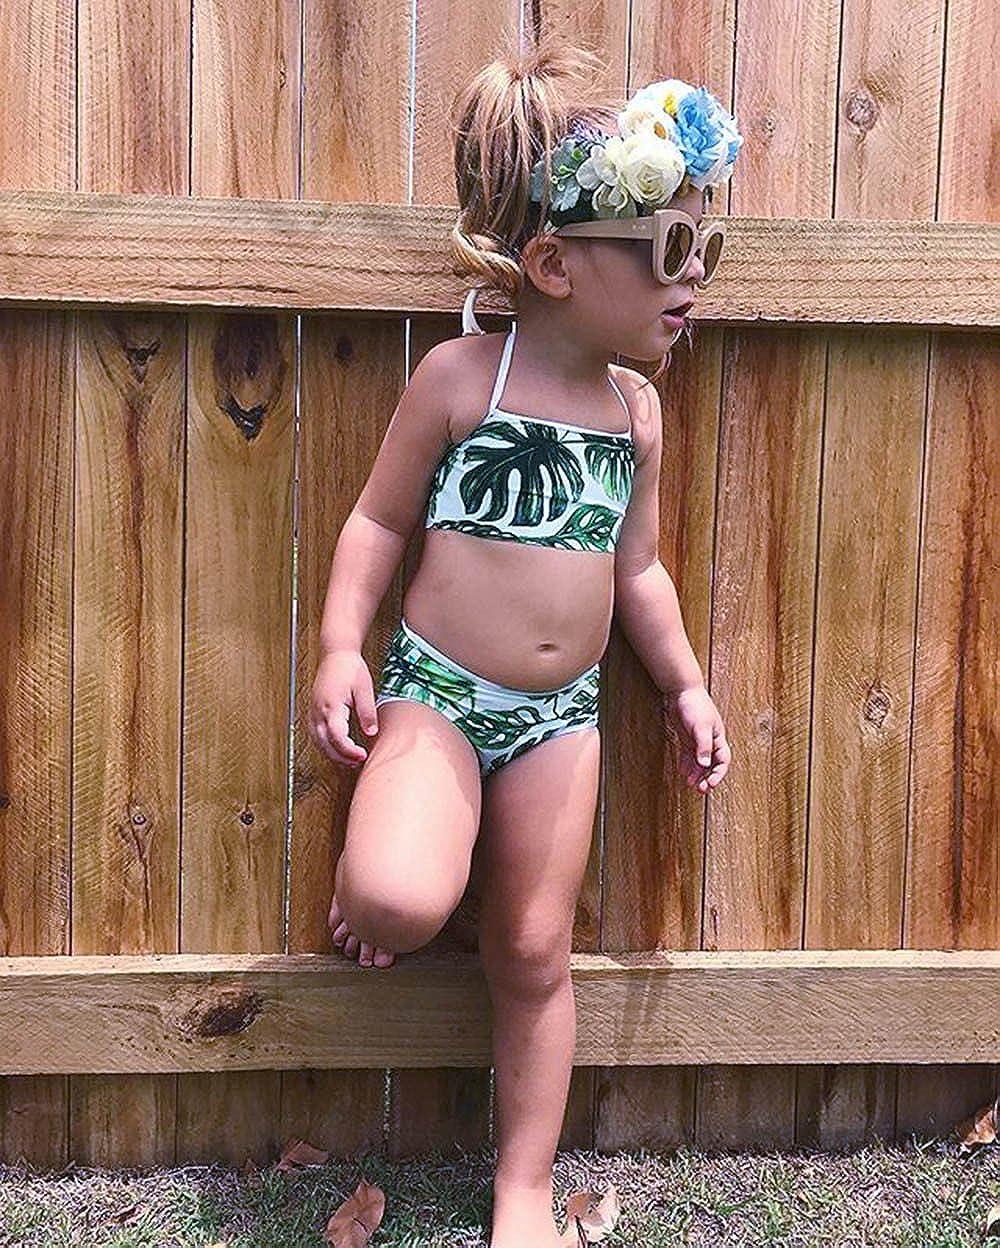 Toddler Kids Baby Girls Swimsuit Bikini Set Cuekondy Summer Fashion Leaves Print Tankini Swimwear Beach Bathing Suit